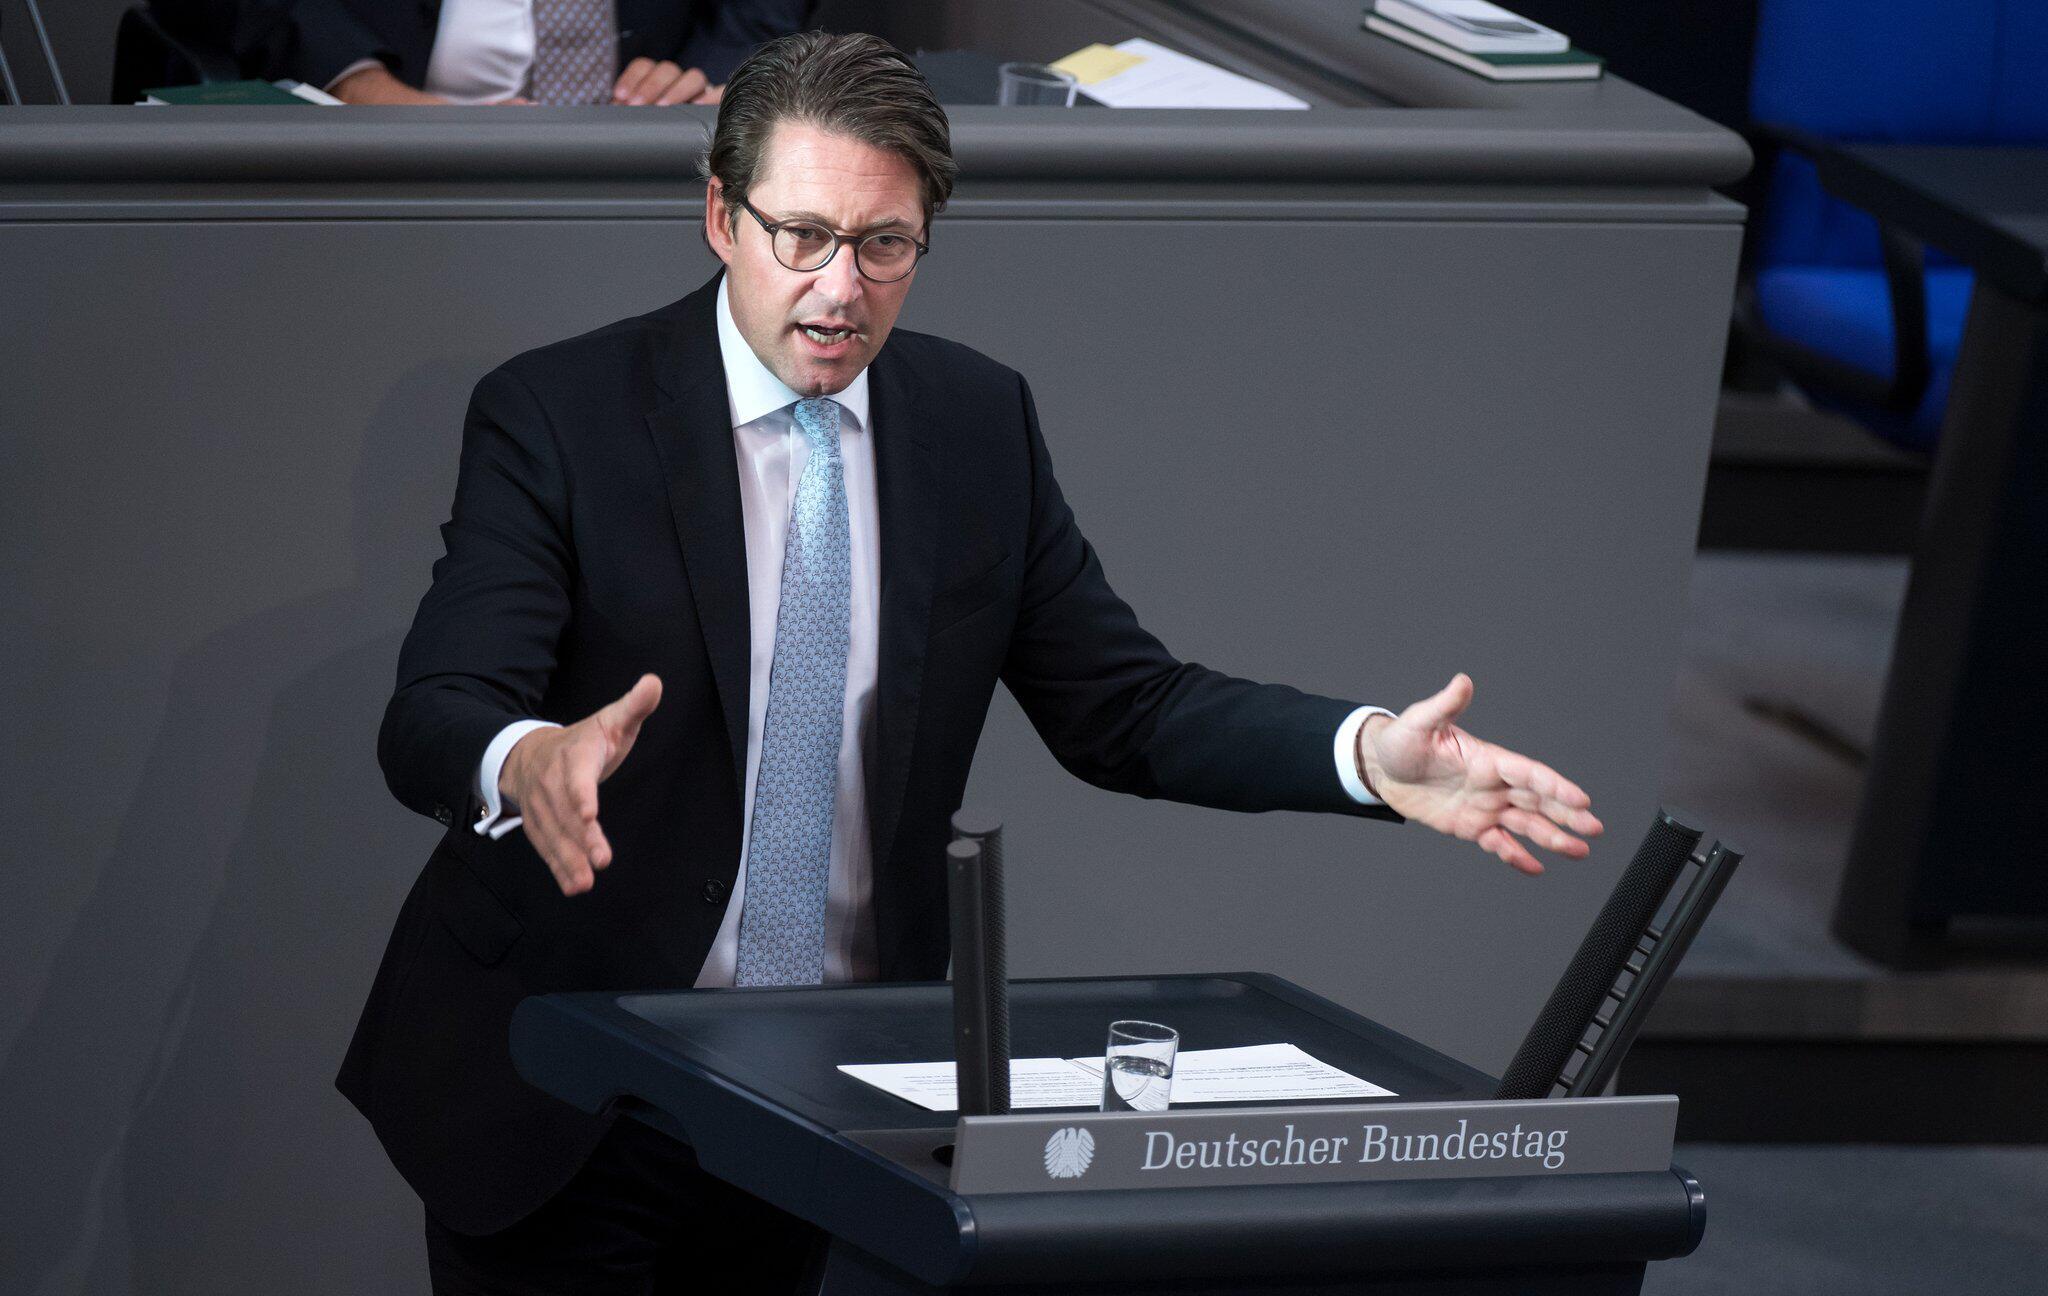 Bild zu Plenary session at the German Bundestag in Berlin